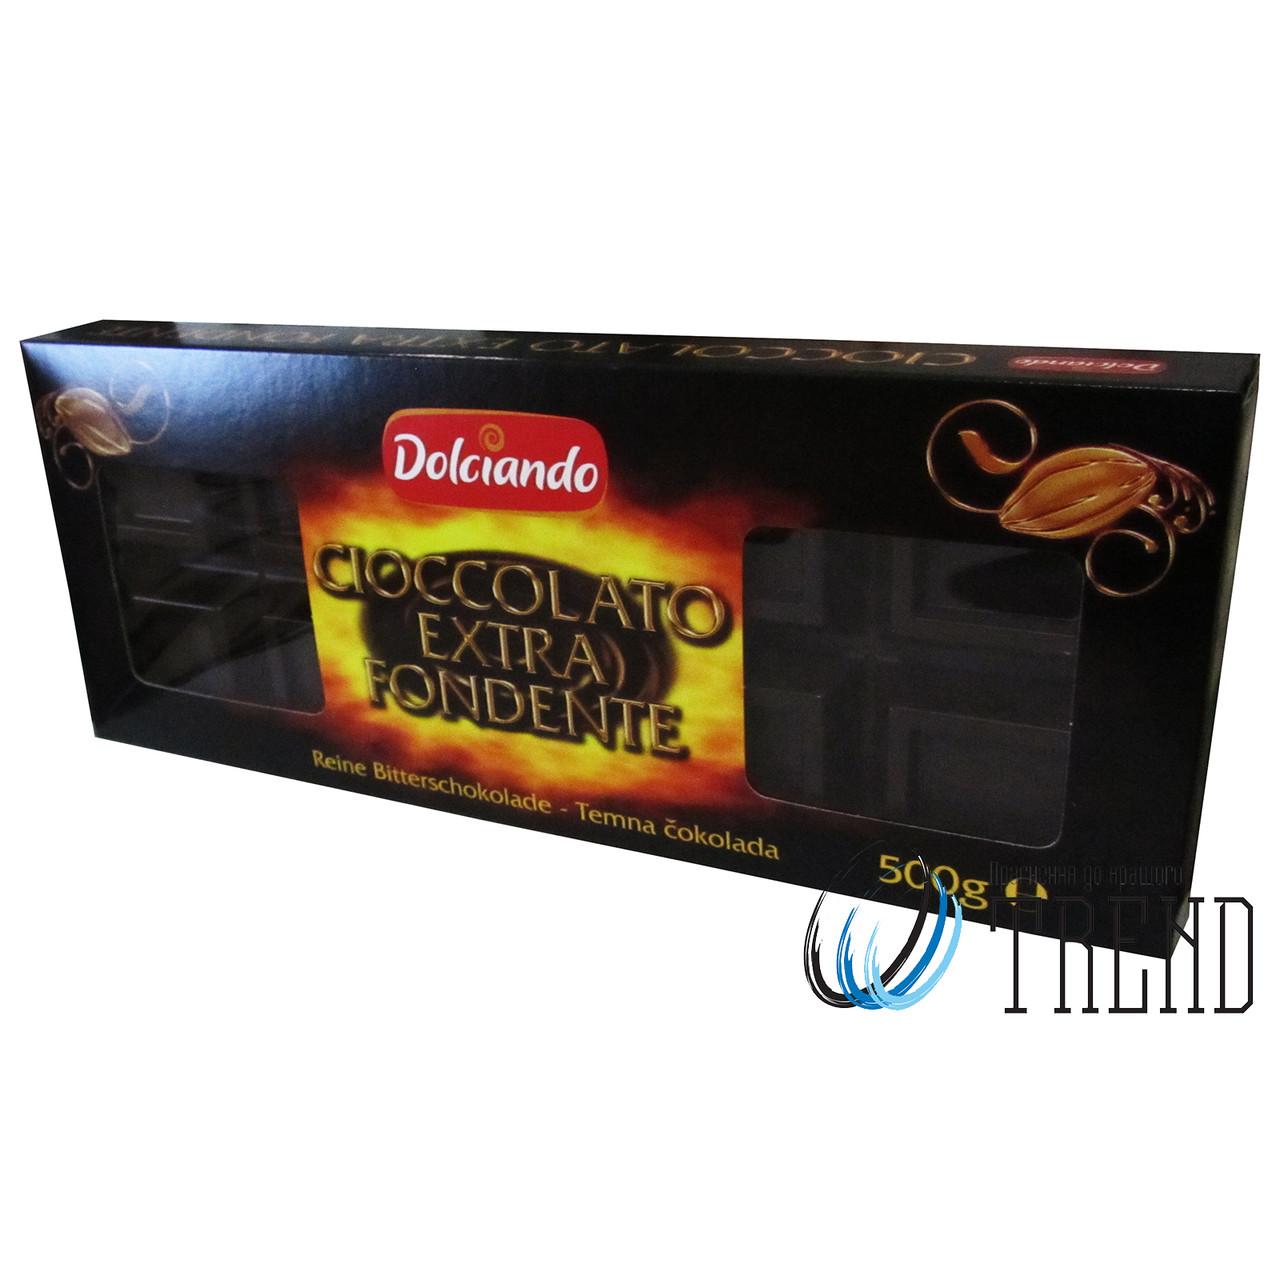 Dolciando Cioccolato Extra Fondente чорний шоколад 500 гр.